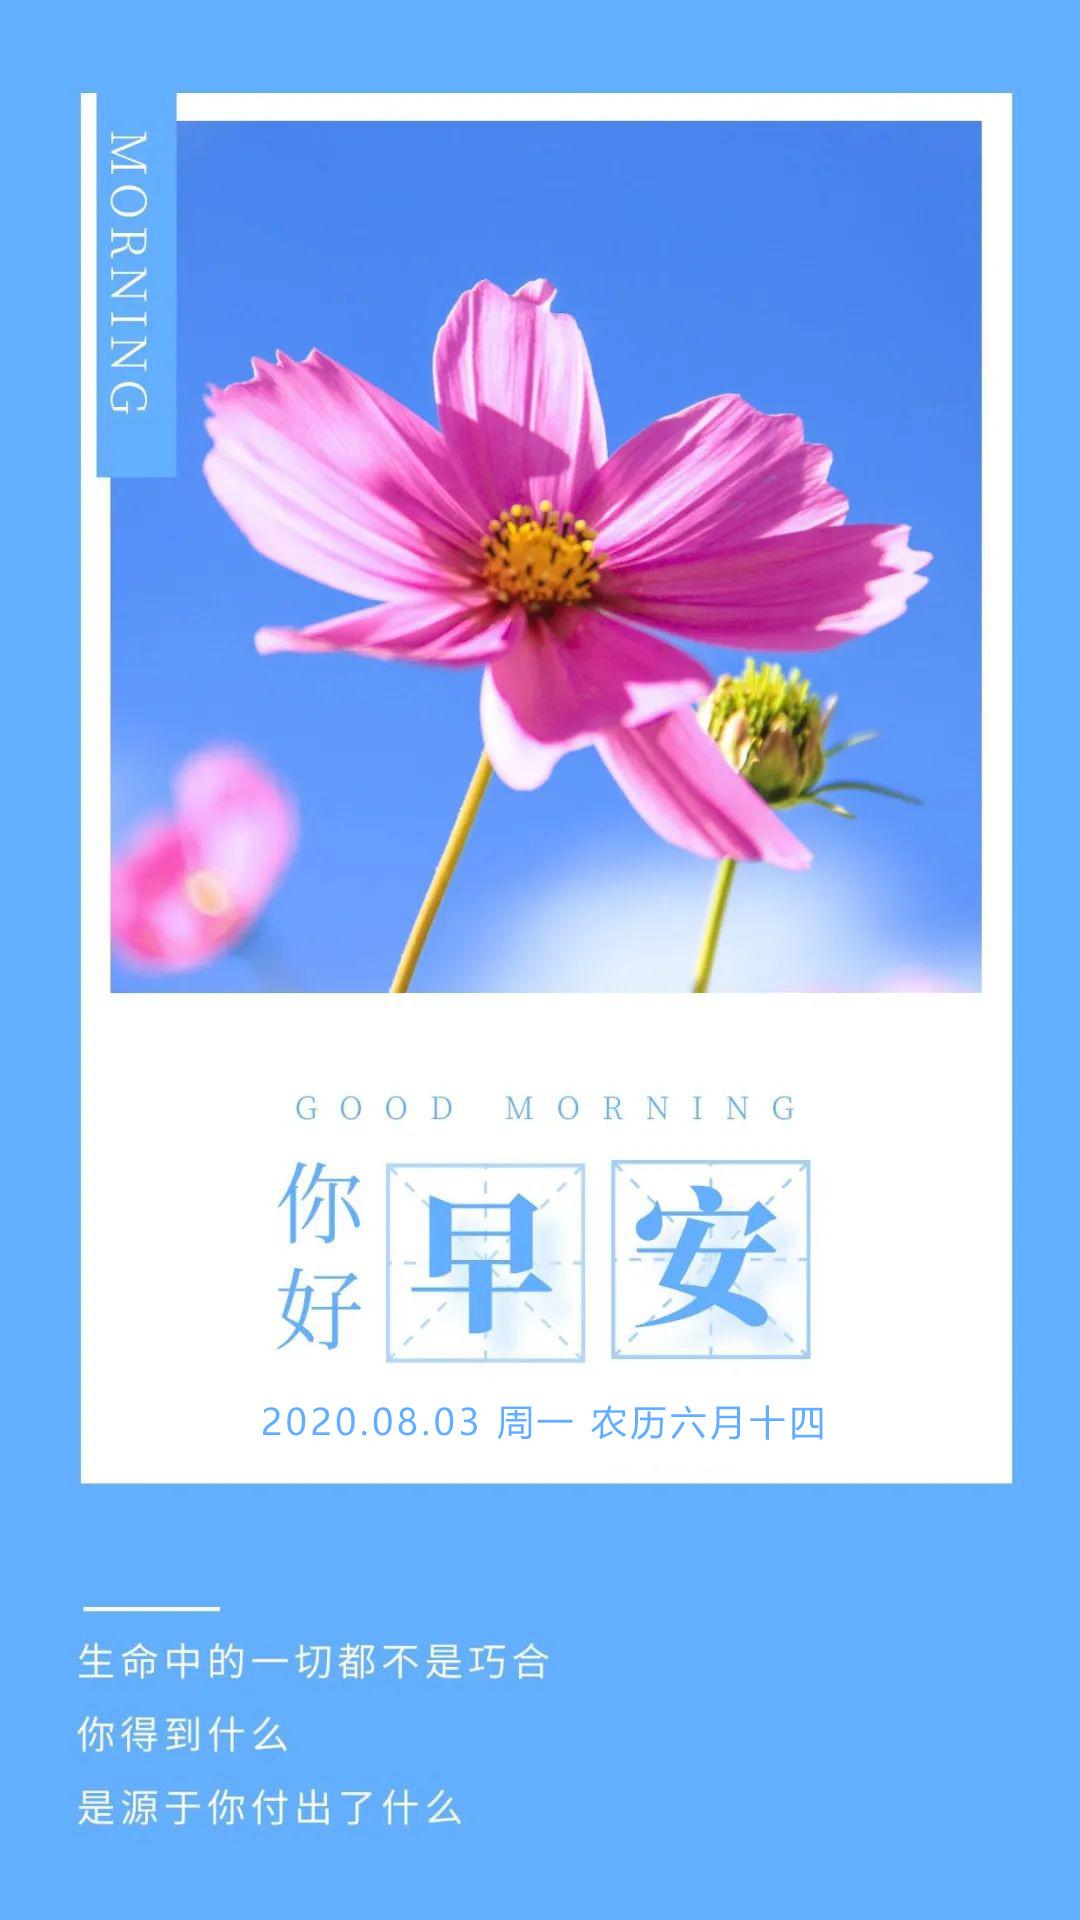 itotii新周早安心语励志图片日签带字:用心生活,用力向上